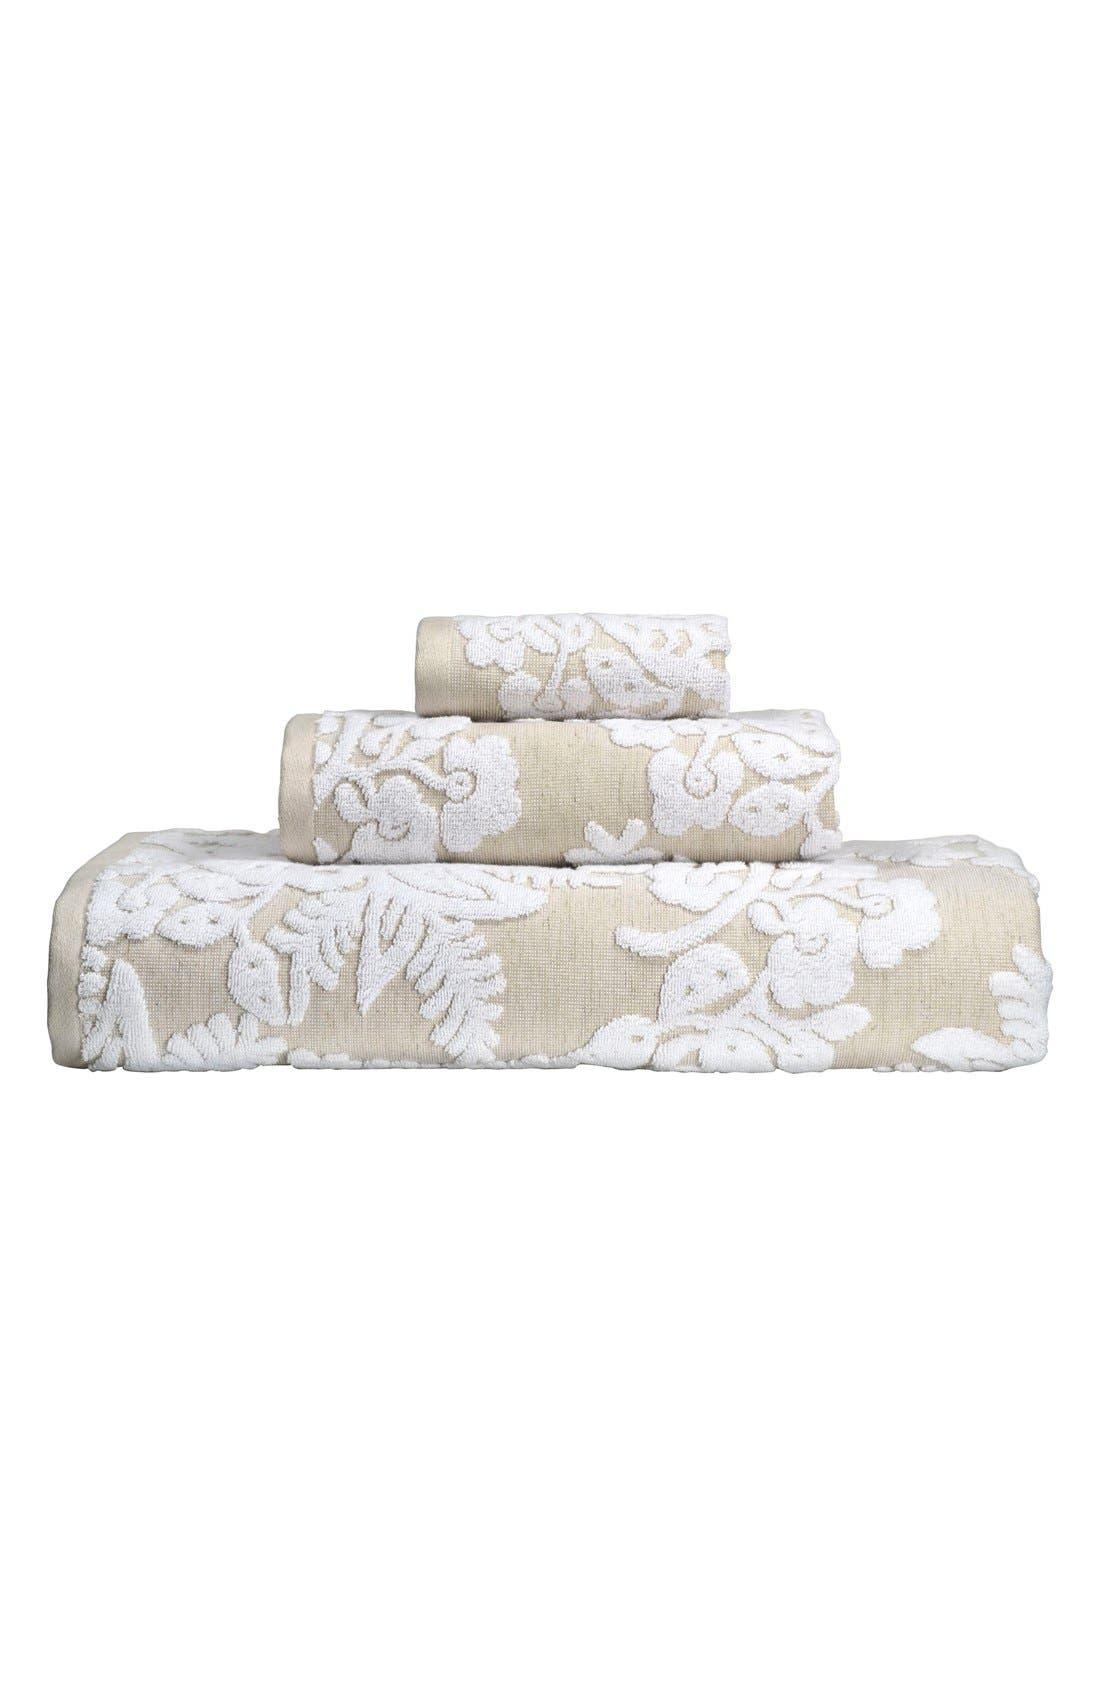 'Pasak' Bath Towel,                             Alternate thumbnail 2, color,                             Linen/ White